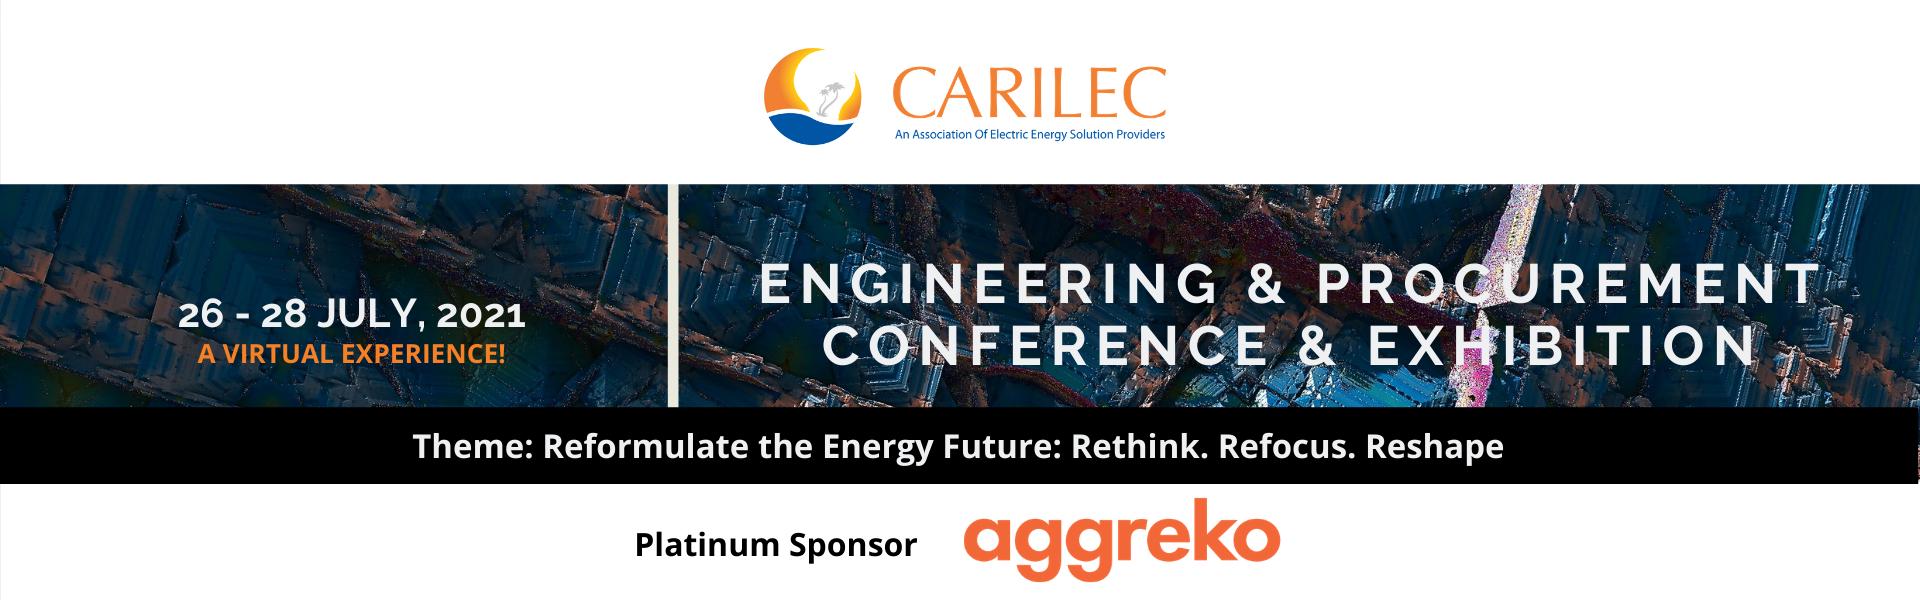 Engineering & Procurement Conference